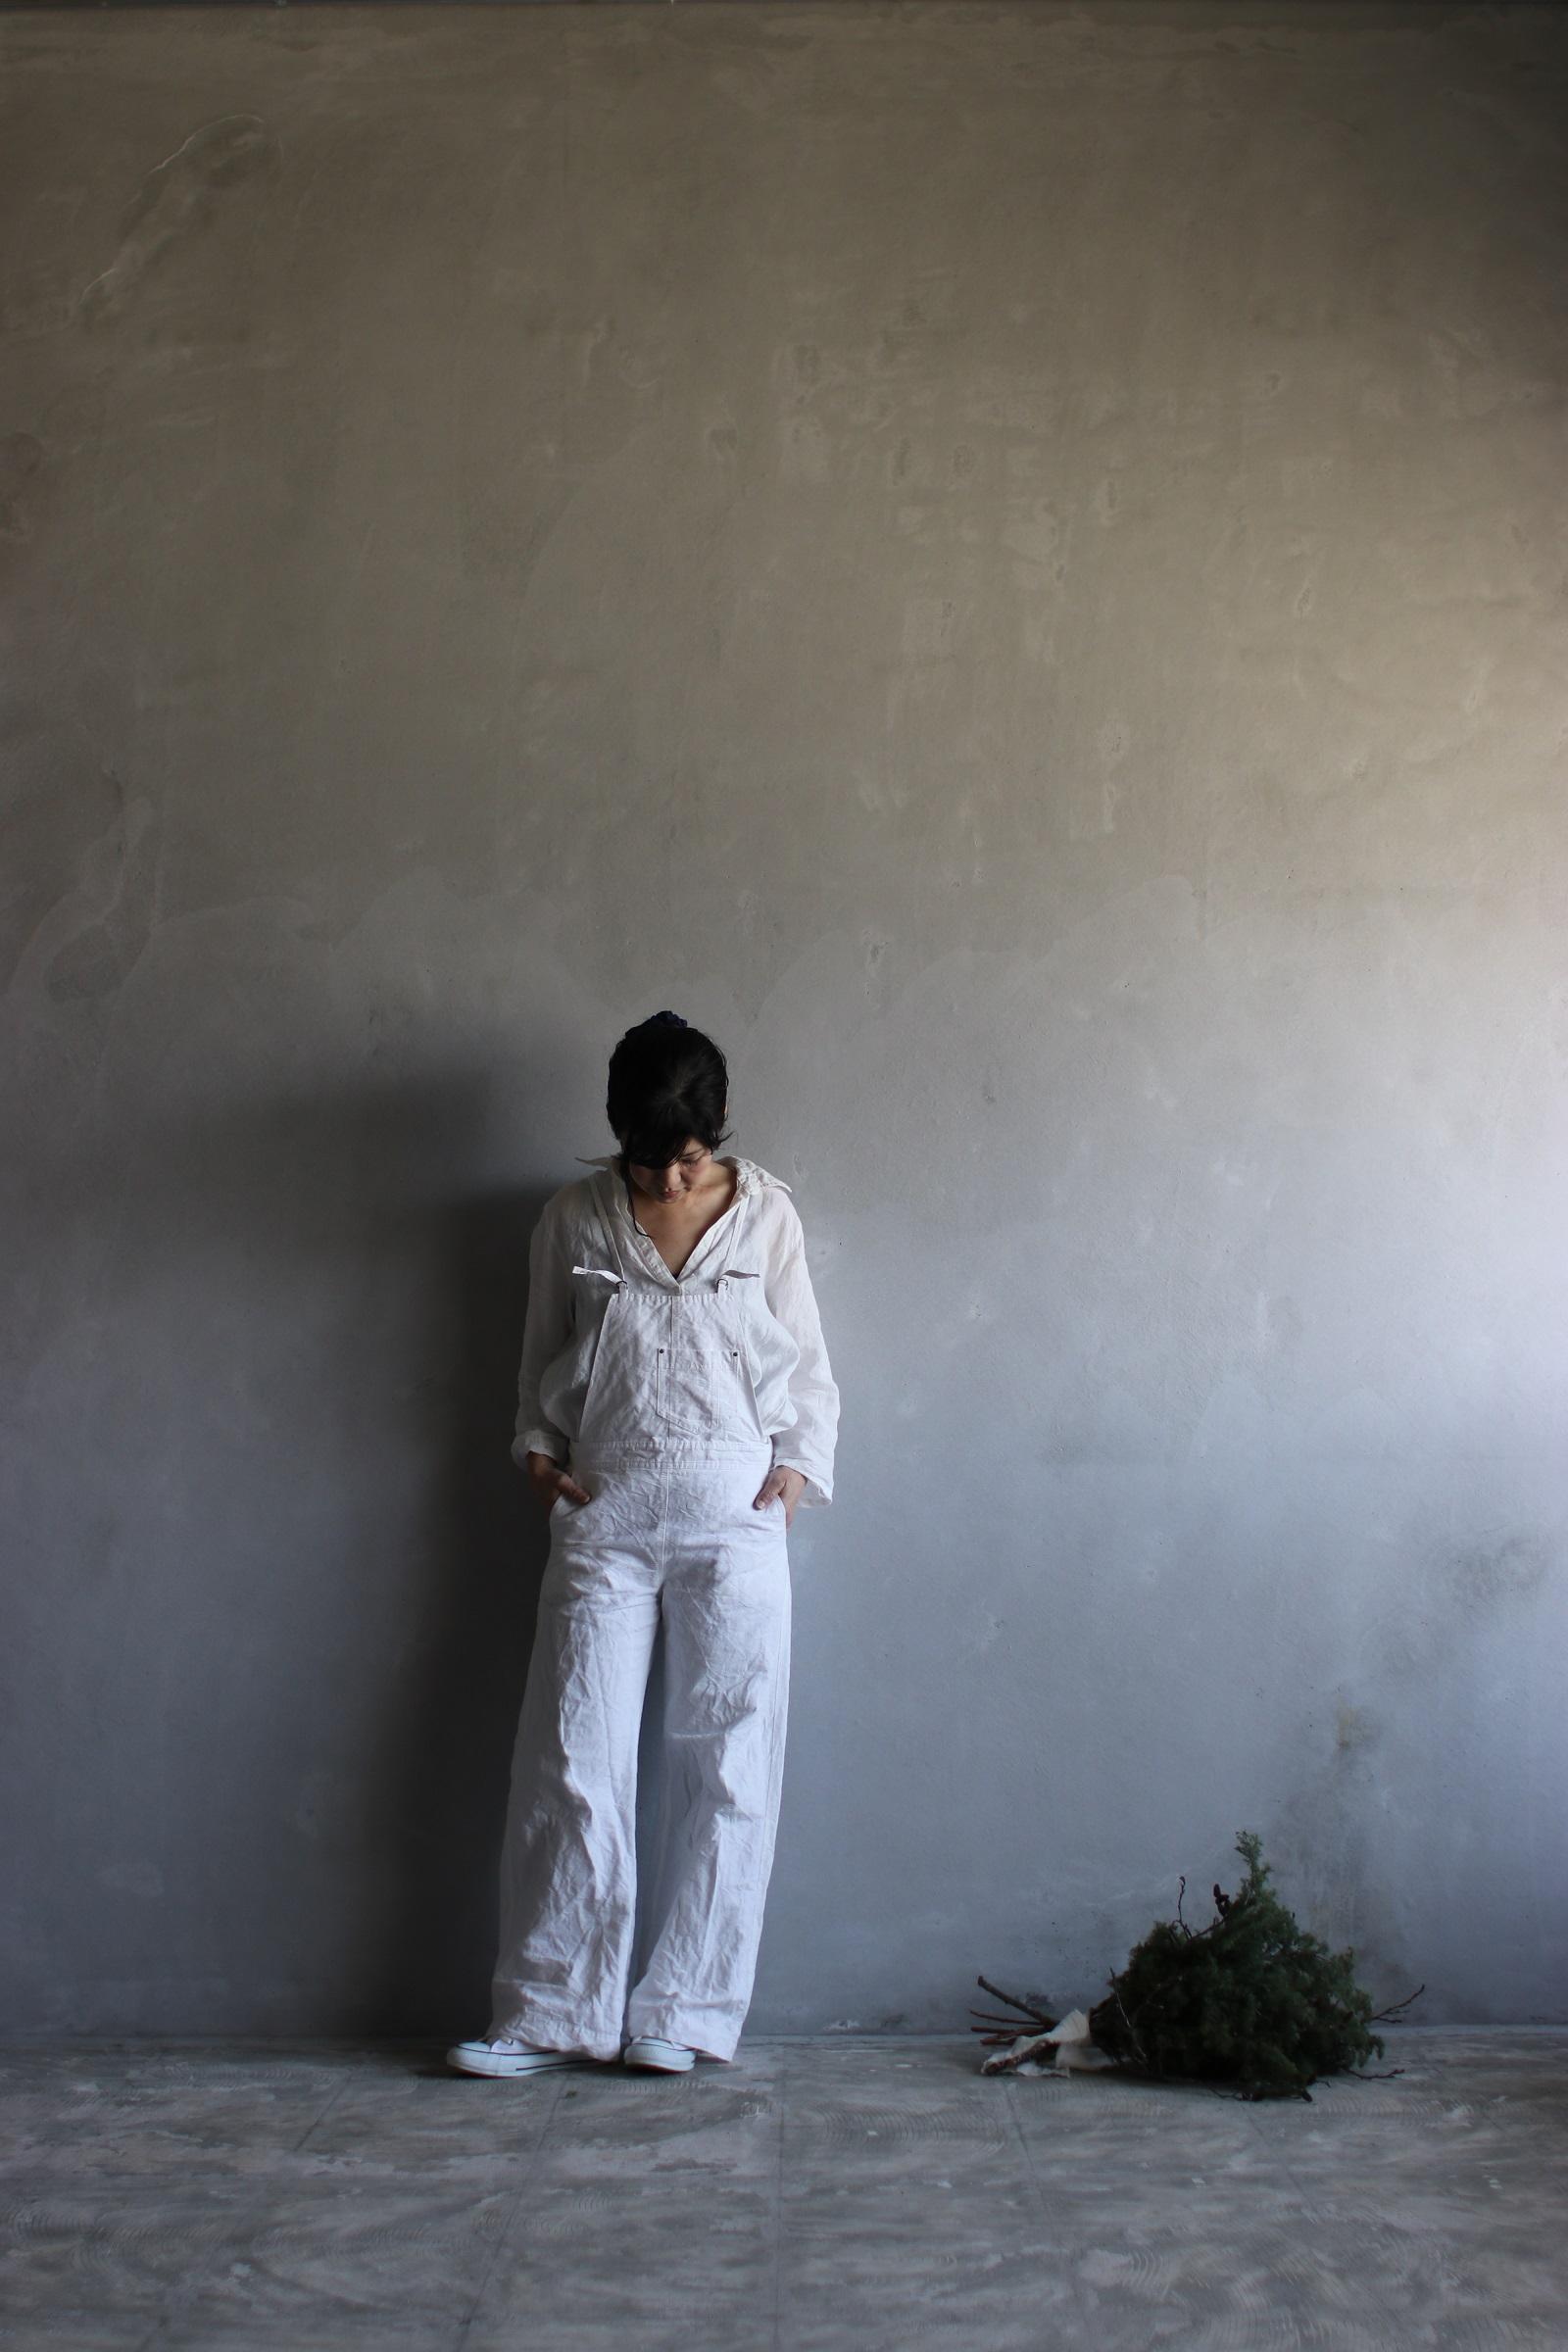 【集う-TSUDOU-】linenu works作品展/静岡掛川